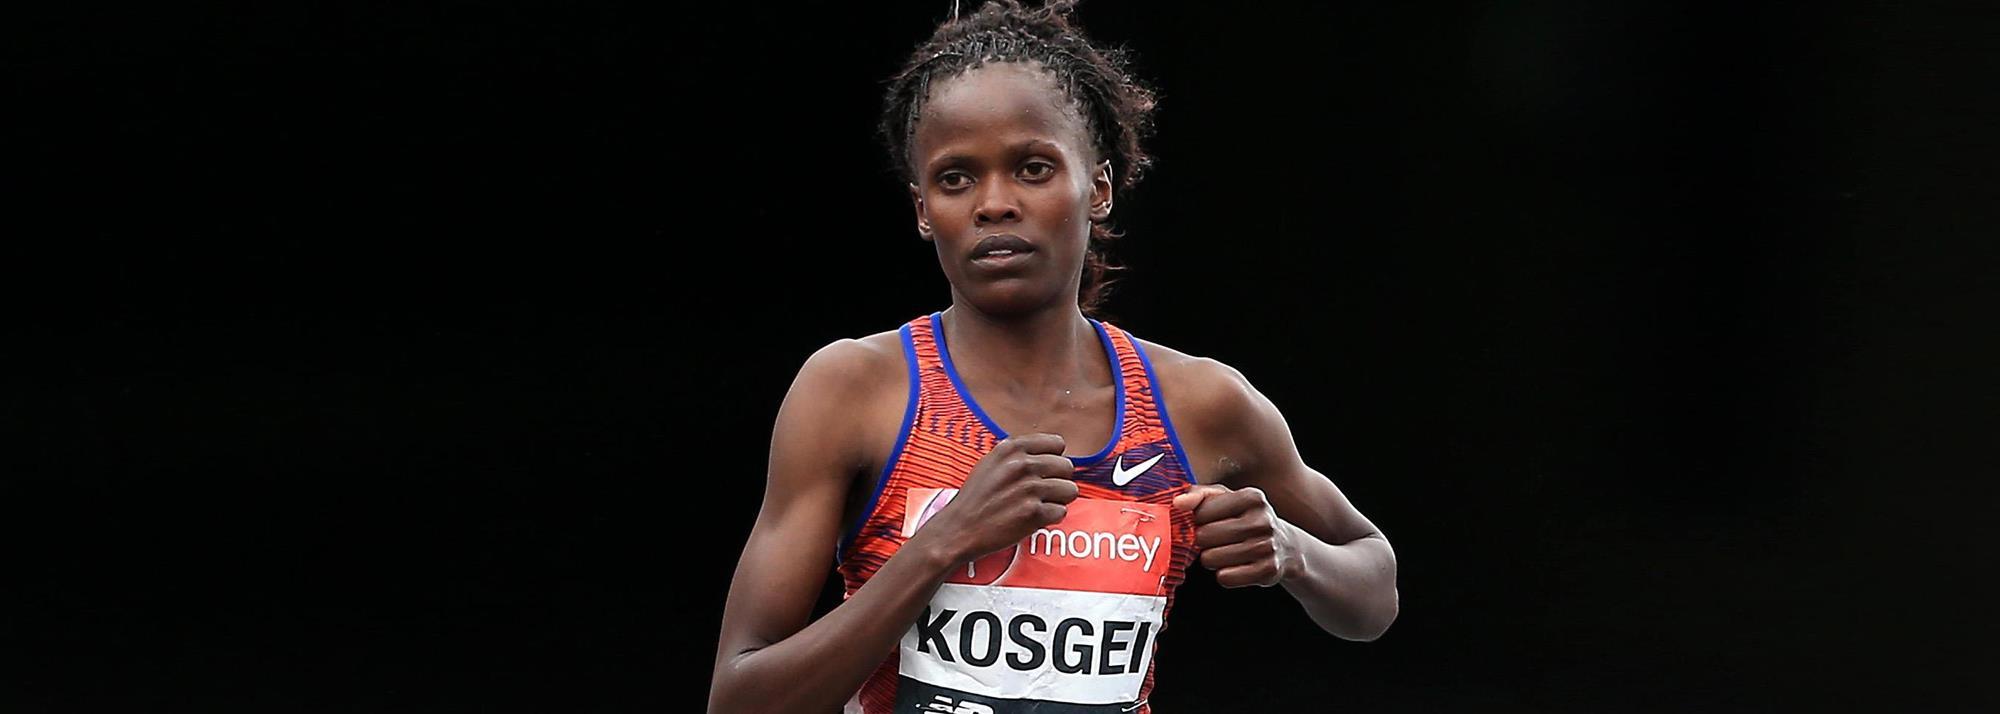 Kosgei leads deep fields for Ras Al Khaimah Half Marathon